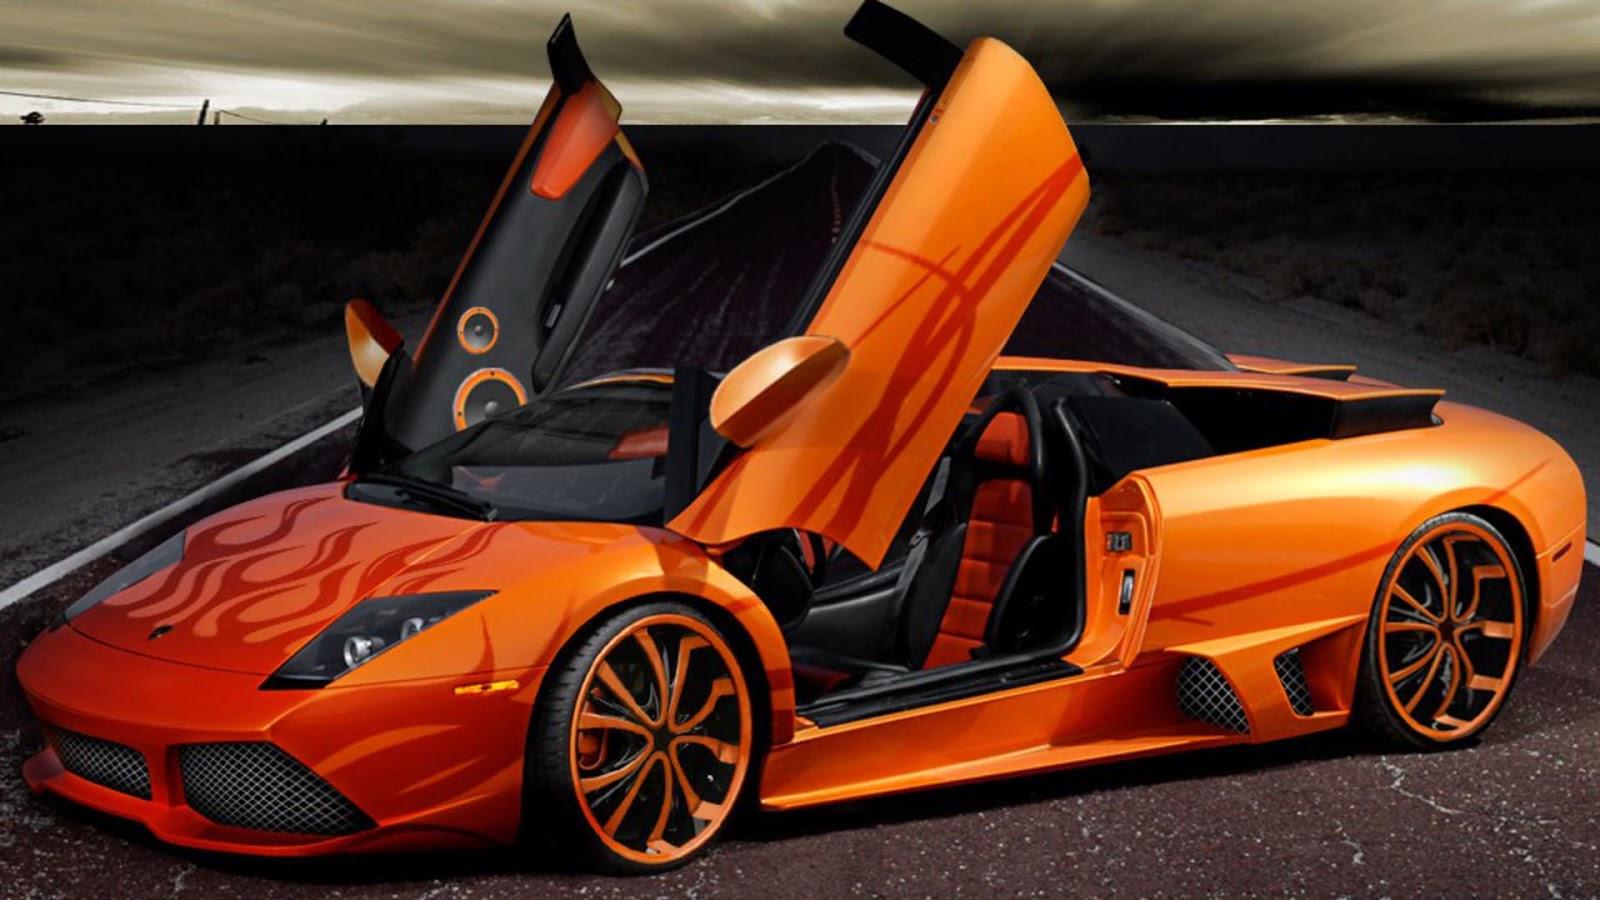 Latest Lamborghini Cars Price List January 2016 | BagiBegi .Com